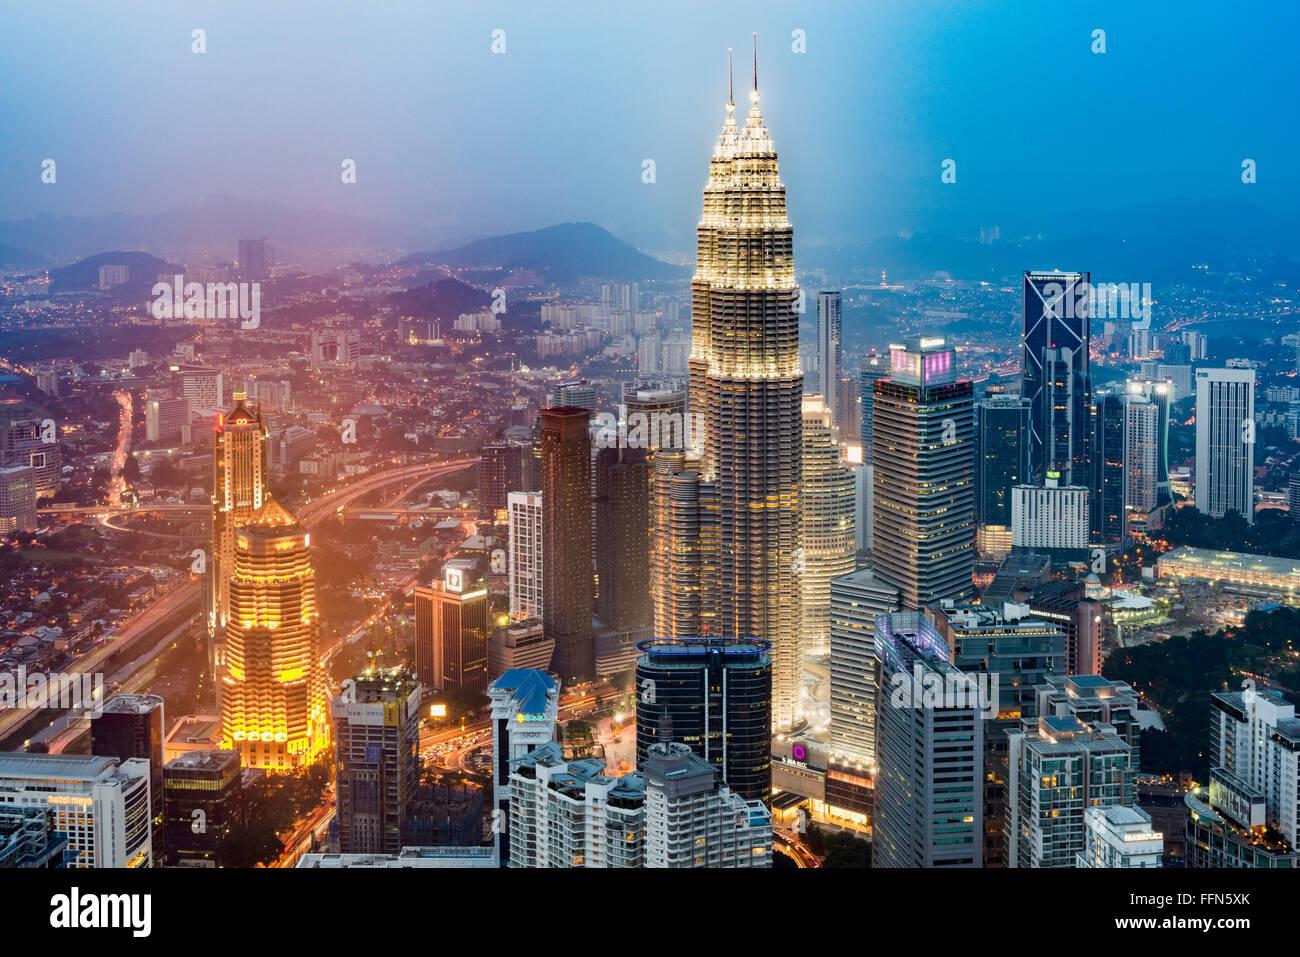 Luftaufnahme der Stadt Kuala Lumpur und die Petronas Towers, Malaysia, Südostasien bei Nacht Stockbild